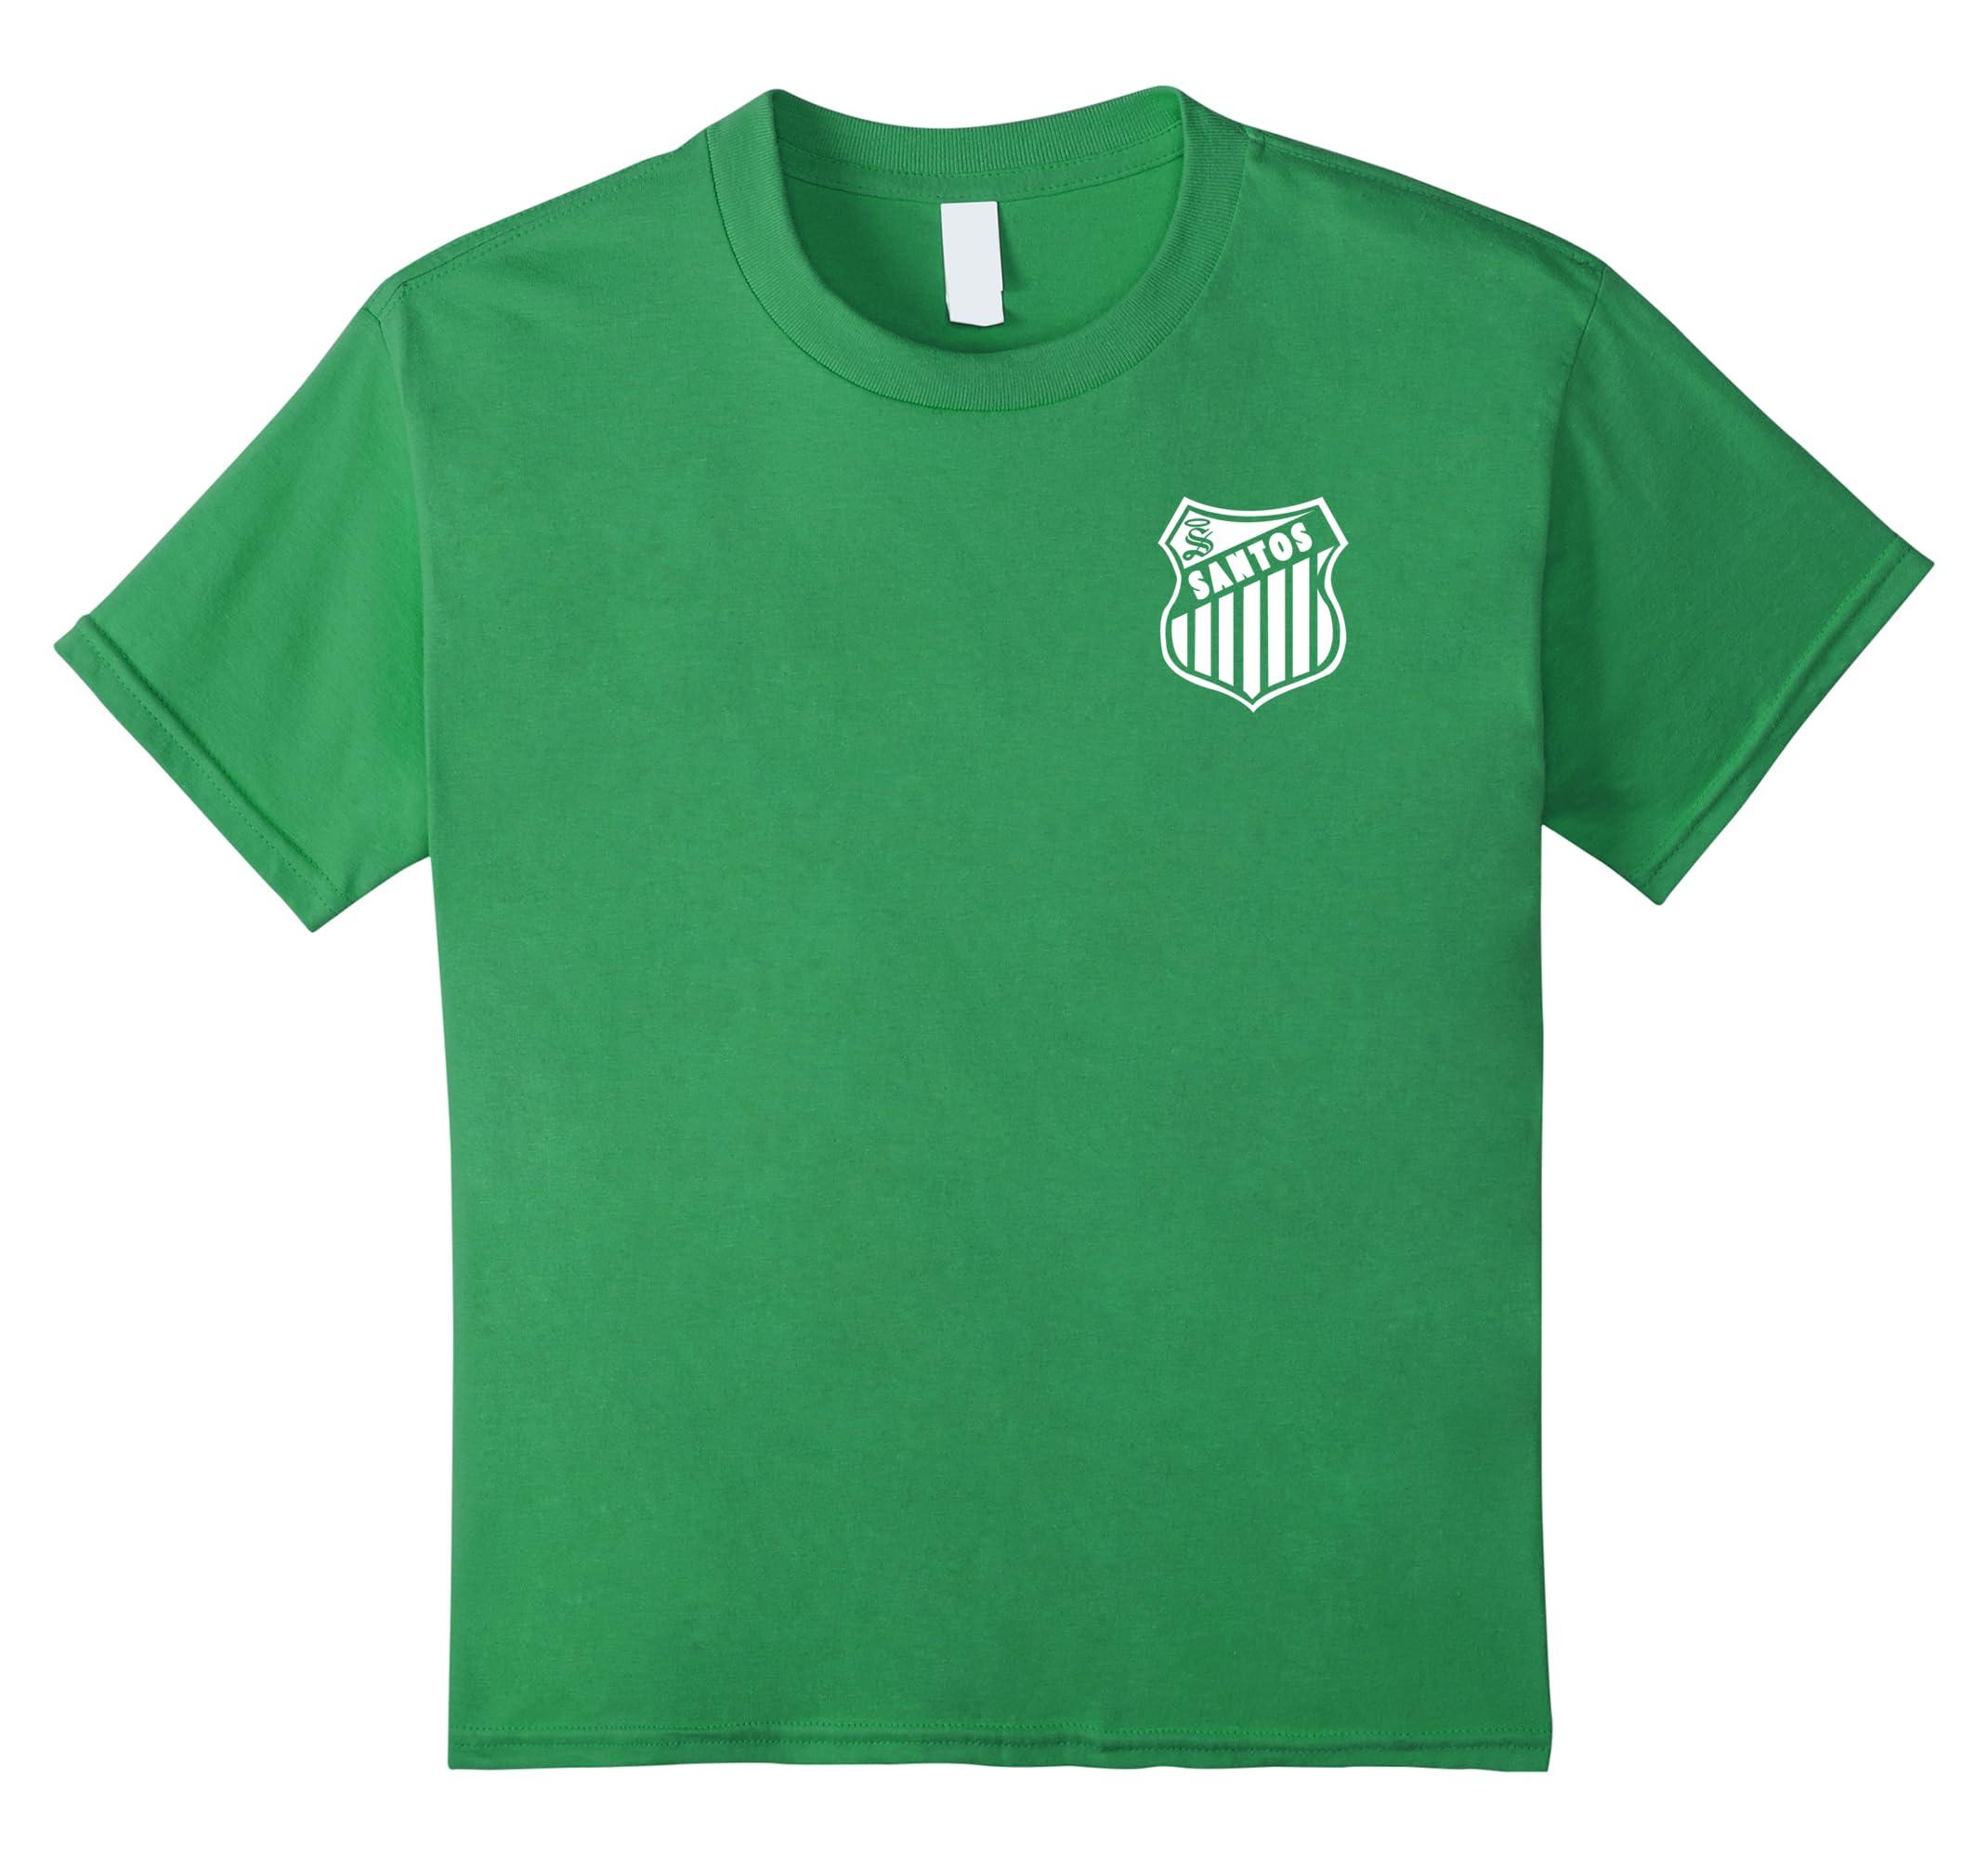 Amazon.com: Santos Laguna RETRO - Jersey Playera Camisa T Shirt Mexico: Clothing